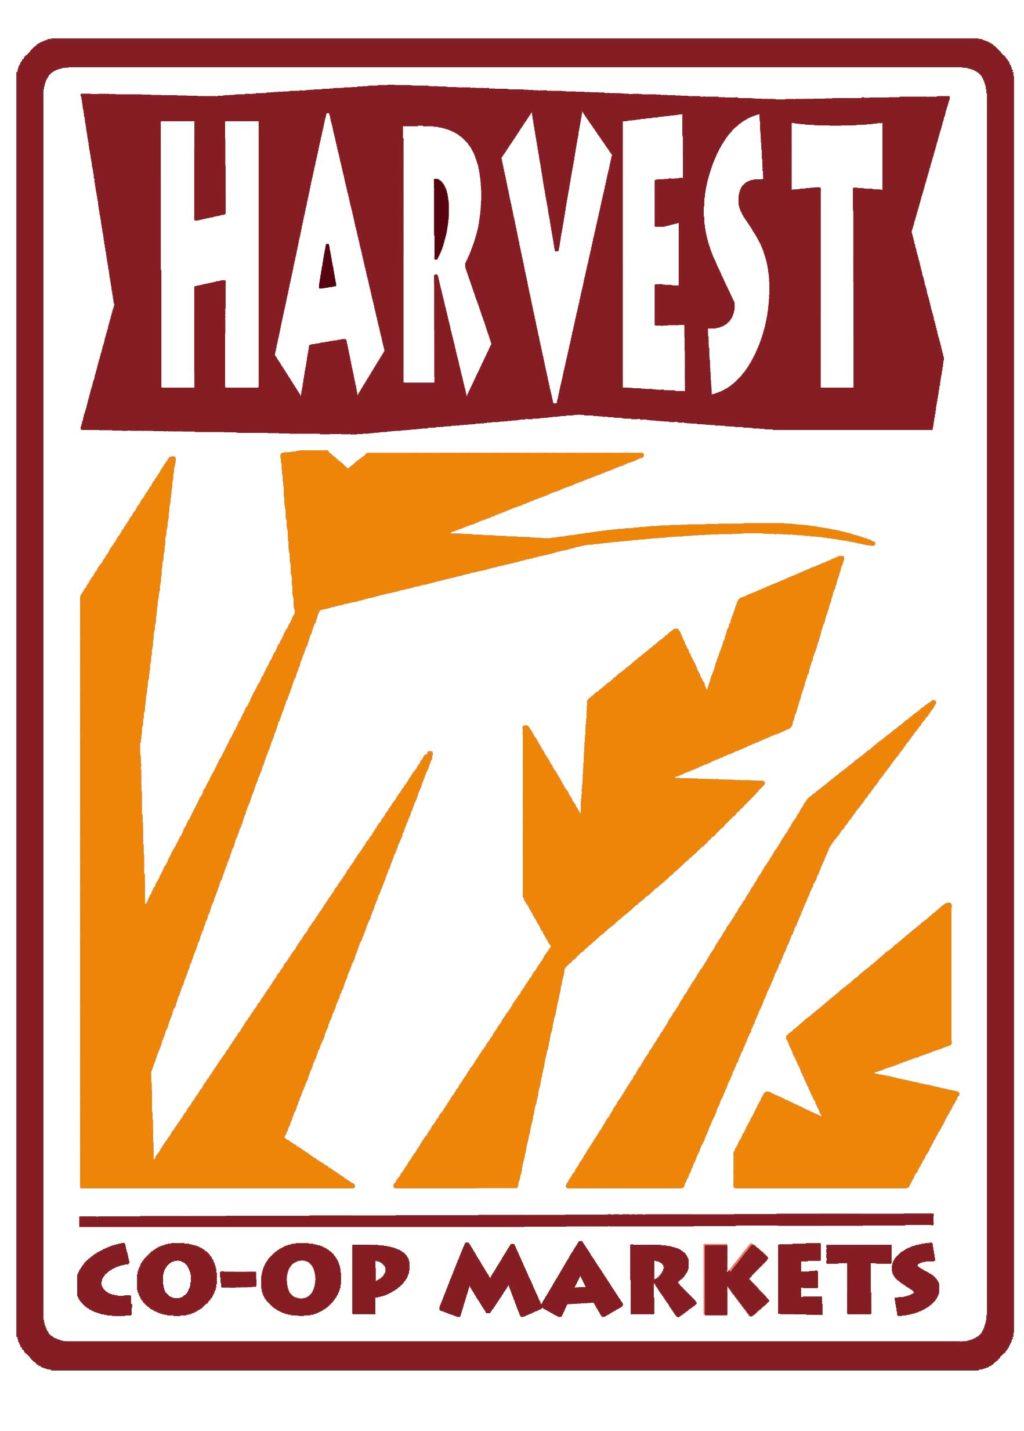 Harvest Co-op Markets